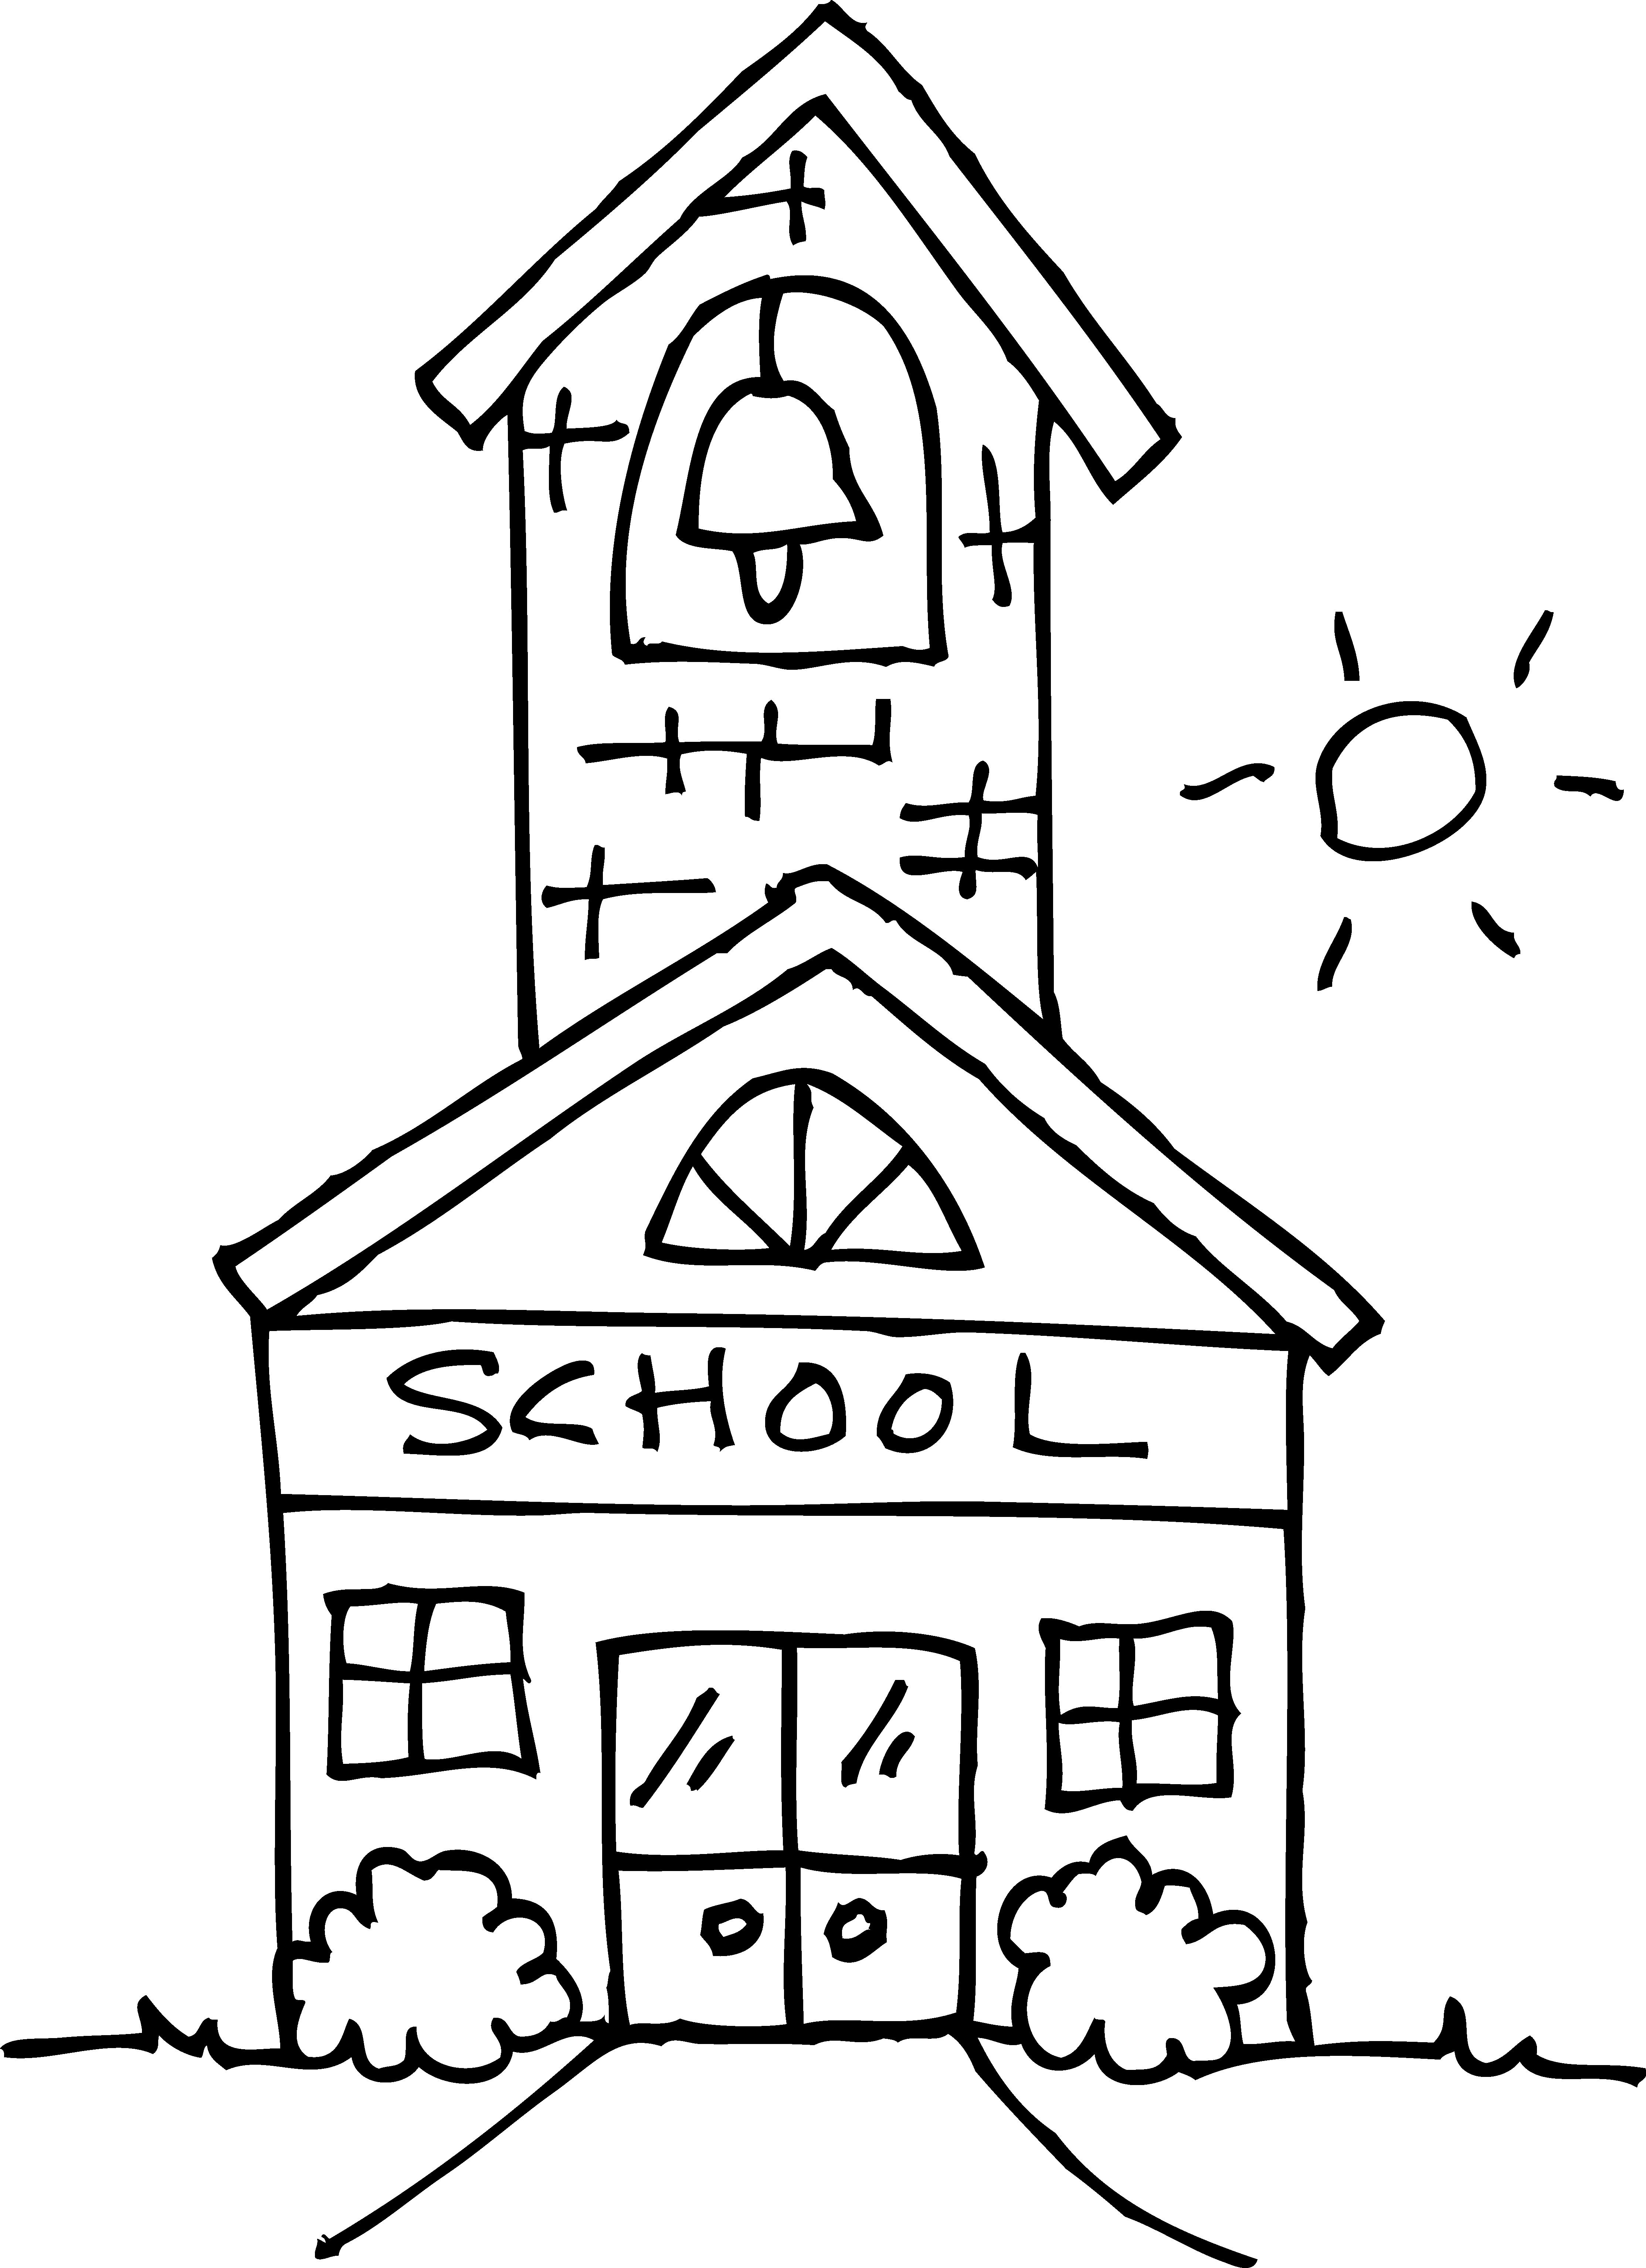 School clipart coloring page vector download Free School Building School Clipart School Color Building ... vector download